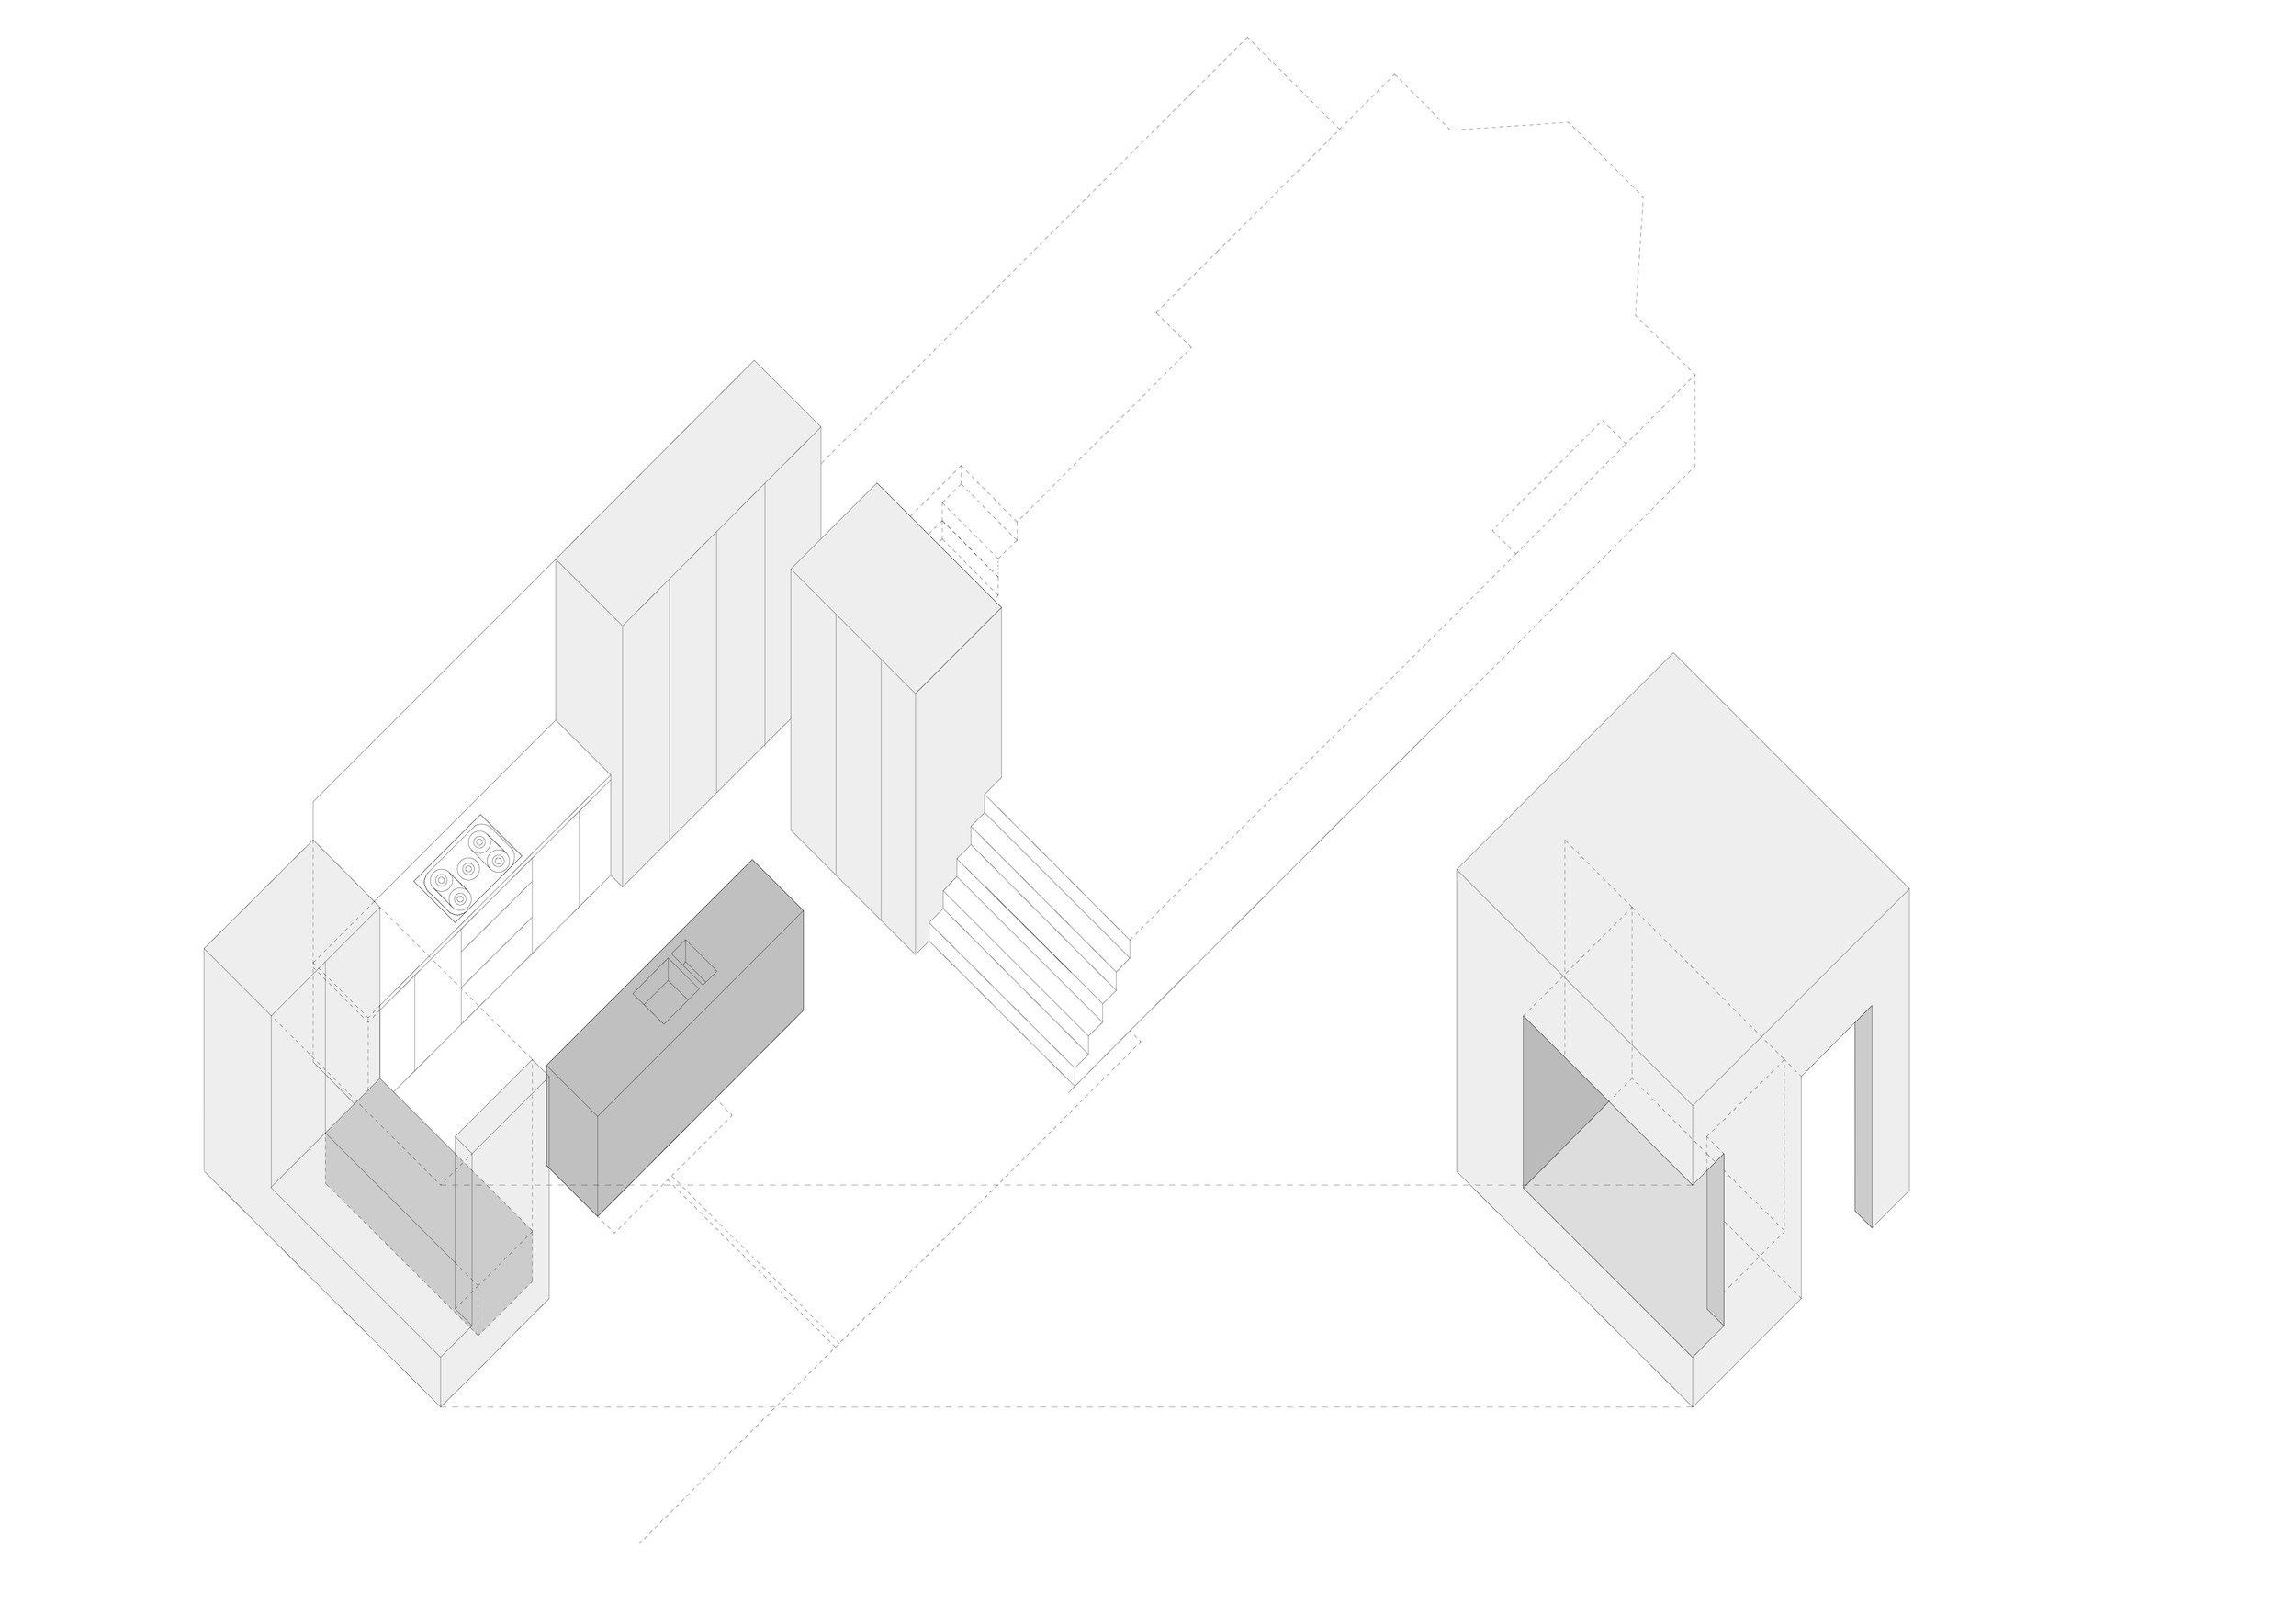 110_Intersect House_Axo.jpg